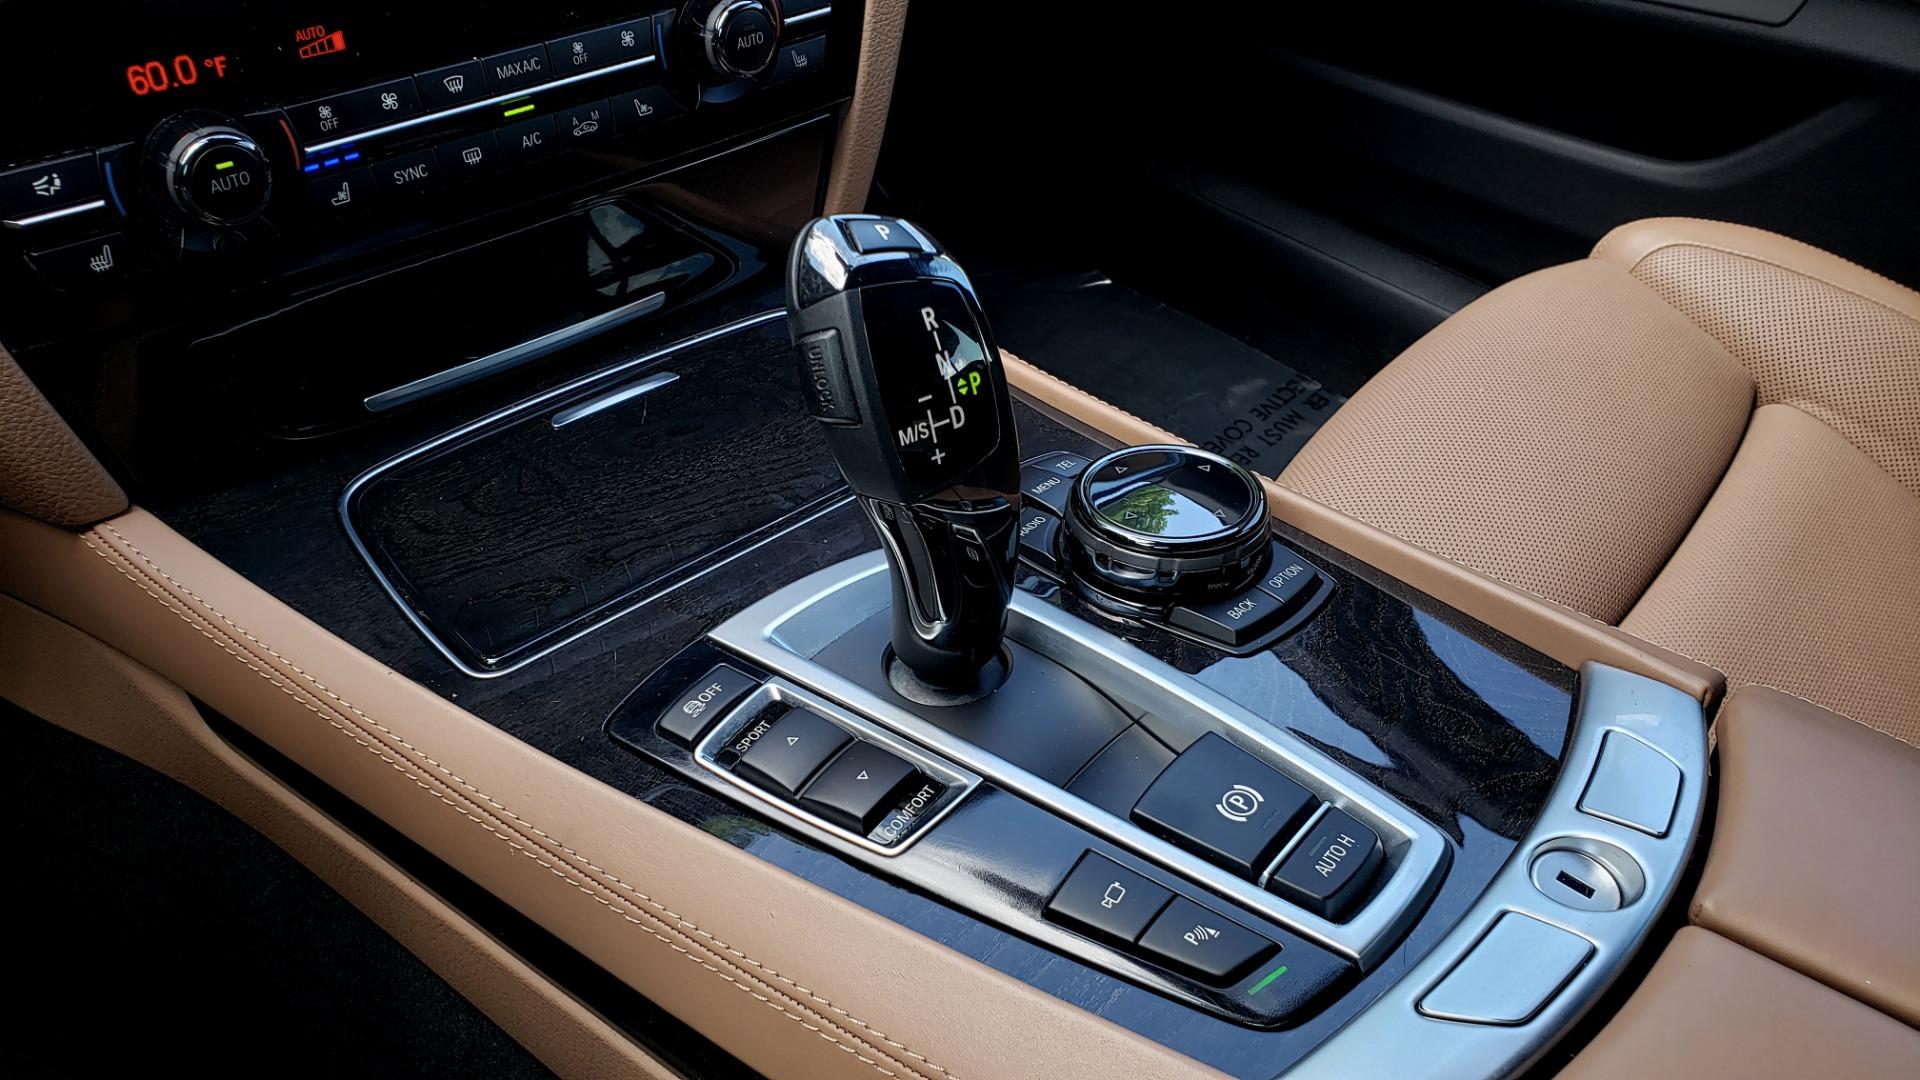 Used 2014 BMW 7 SERIES 750LI M-SPORT / EXEC PKG / DRVR ASST / LIGHTING / NAV / SUNROOF for sale Sold at Formula Imports in Charlotte NC 28227 46